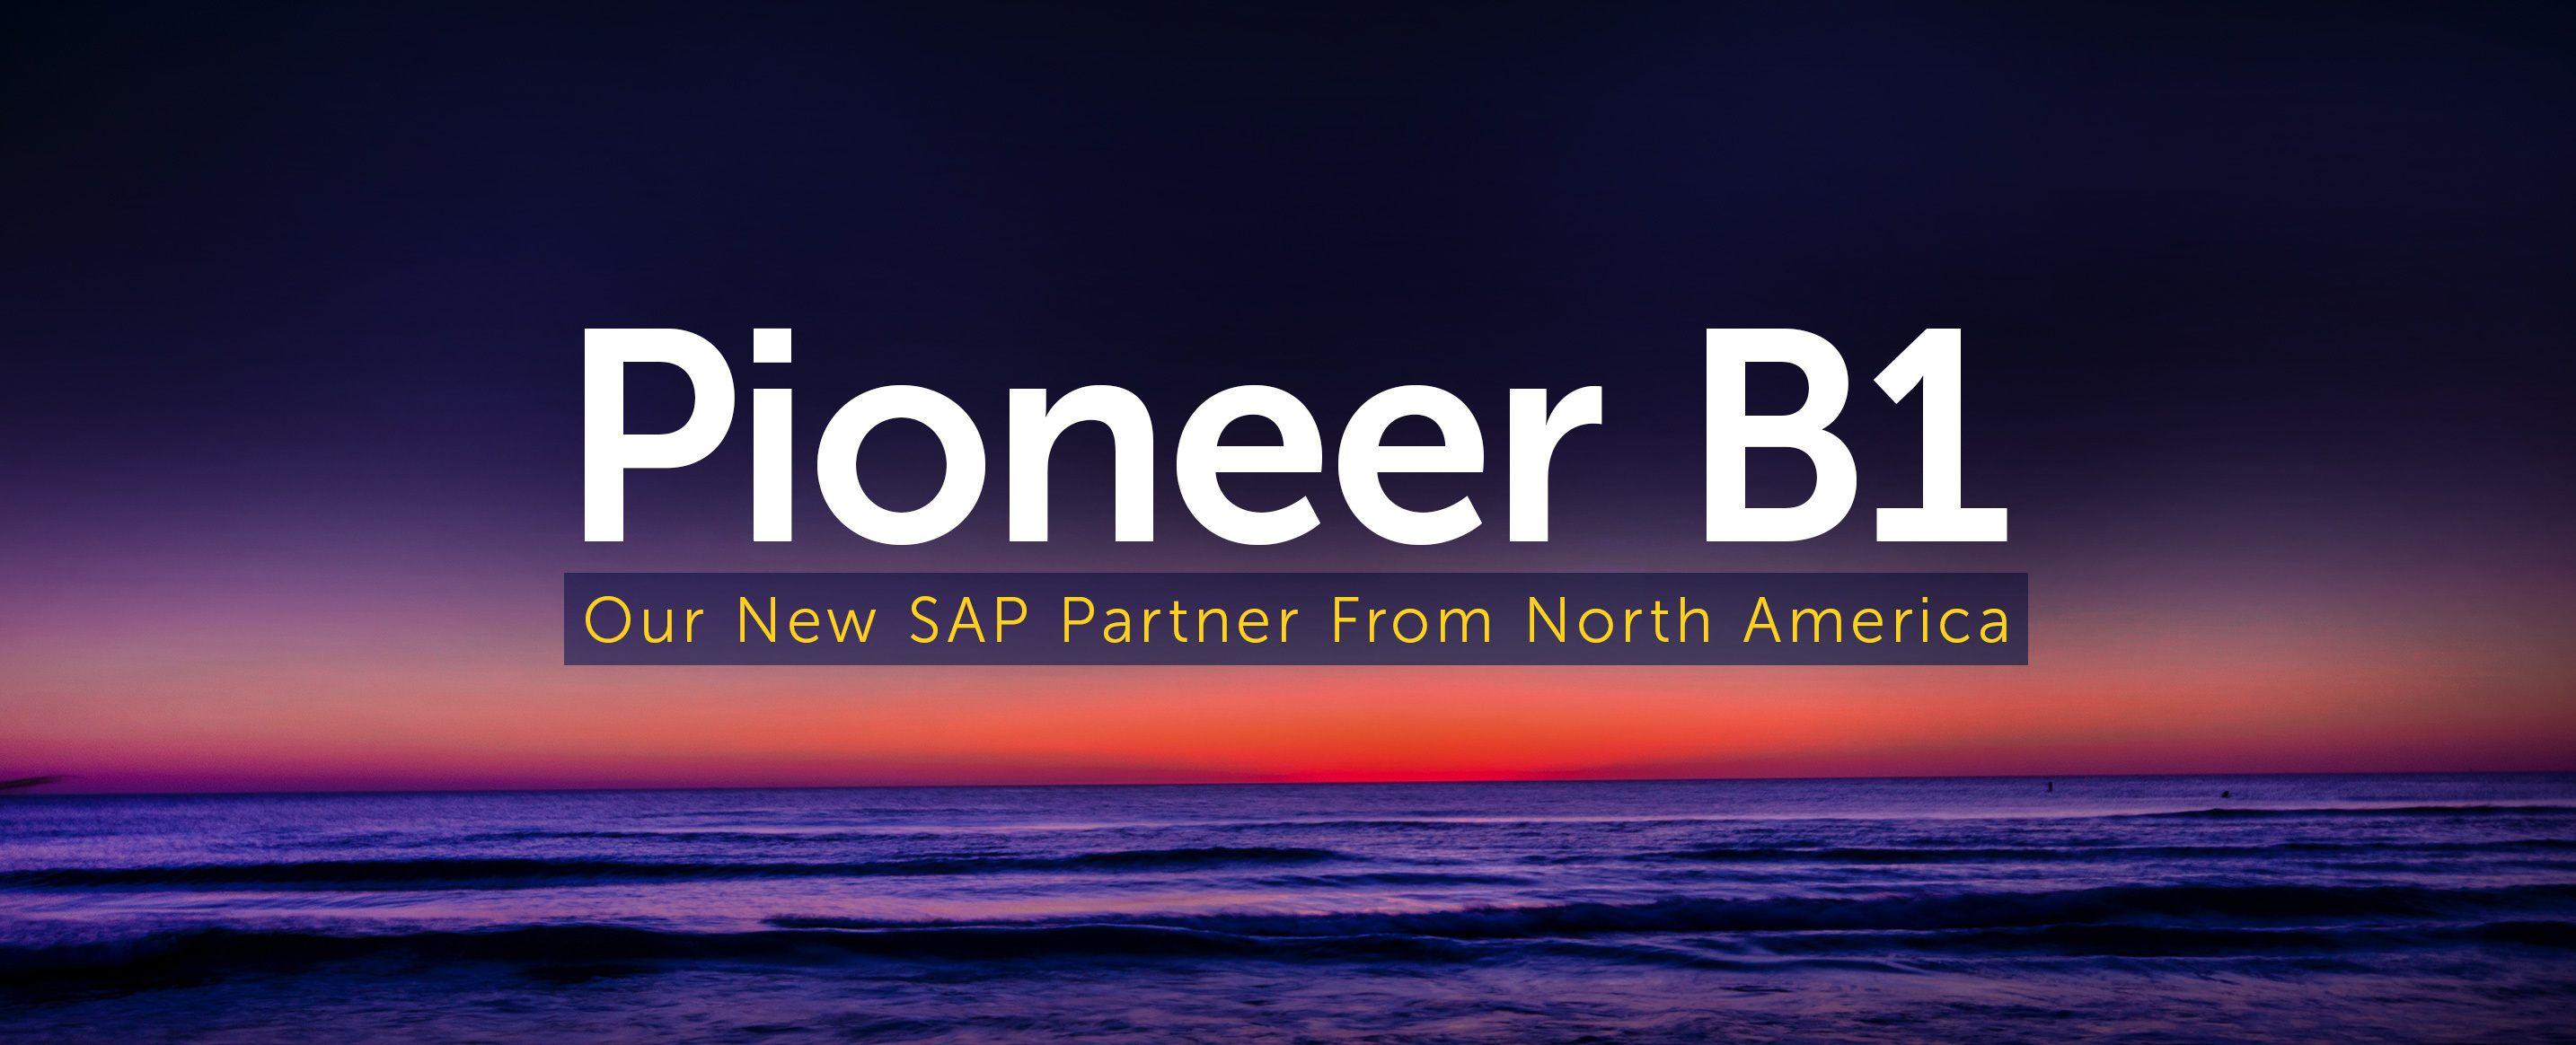 pioneer-b1-sap-b1-partner-north-america